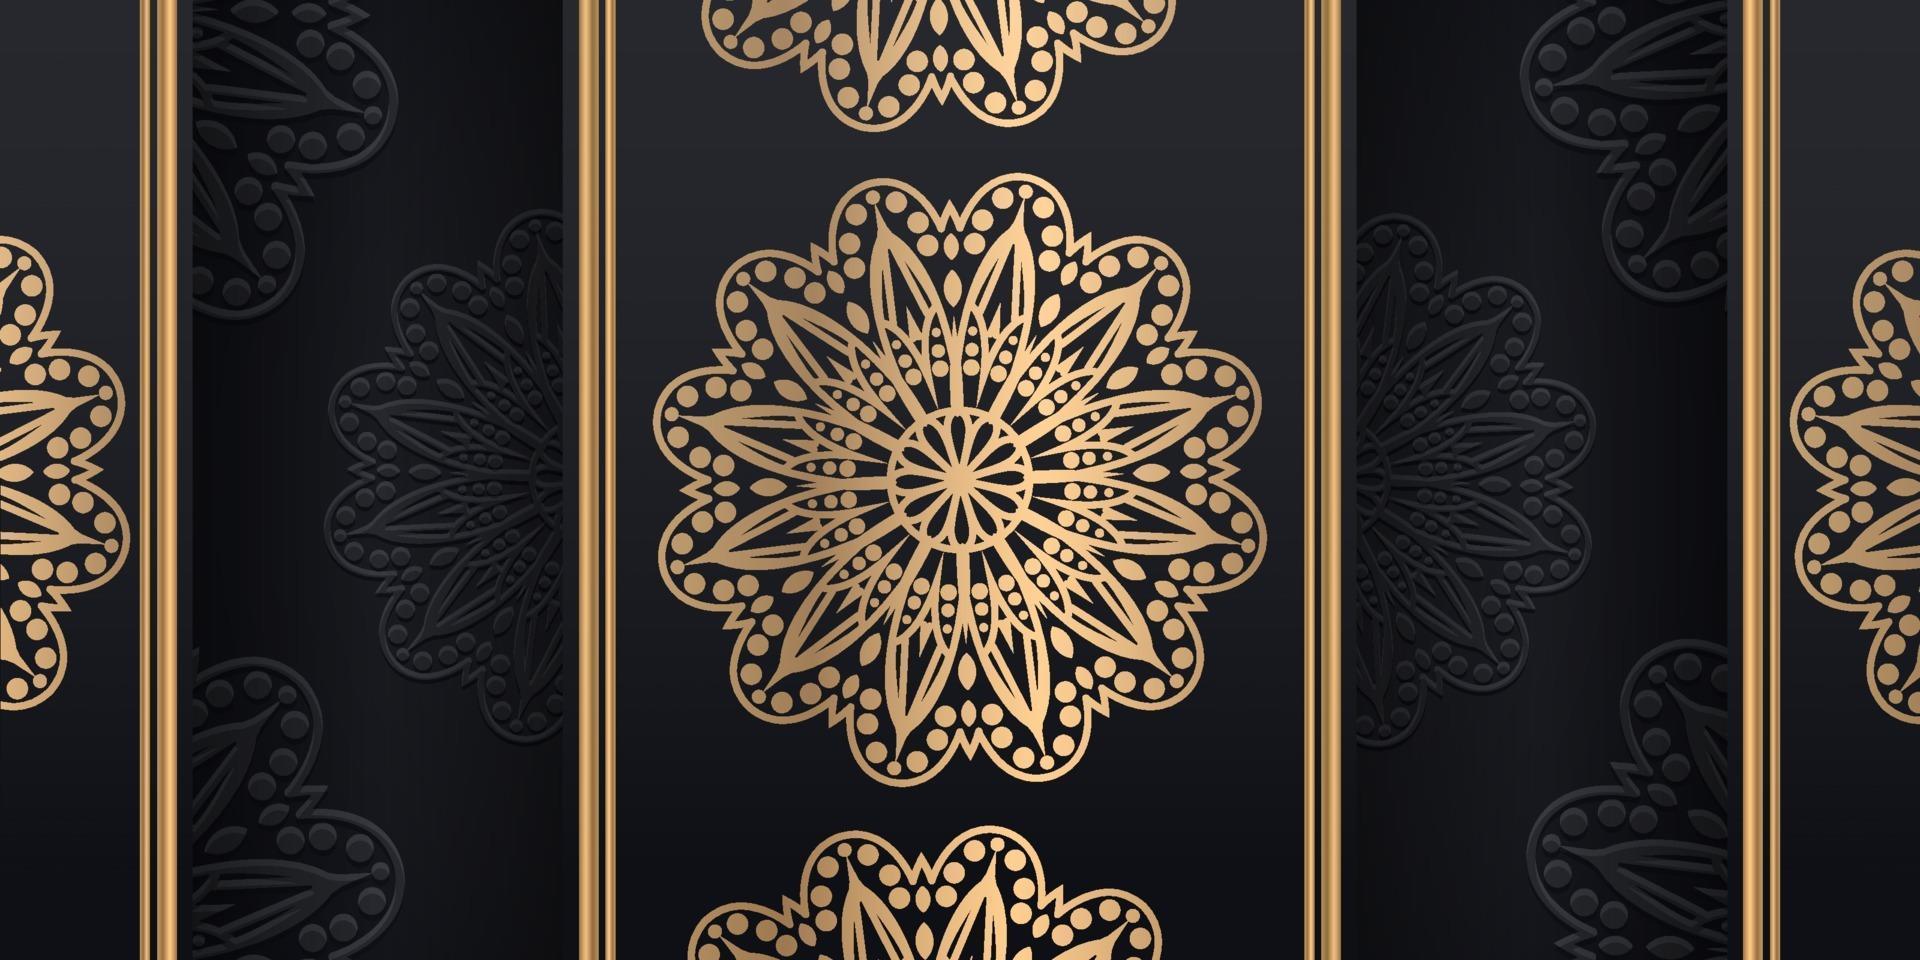 Luxus Zier Mandala Design Hintergrund in Gold Farbe, Vektor-Illustration vektor